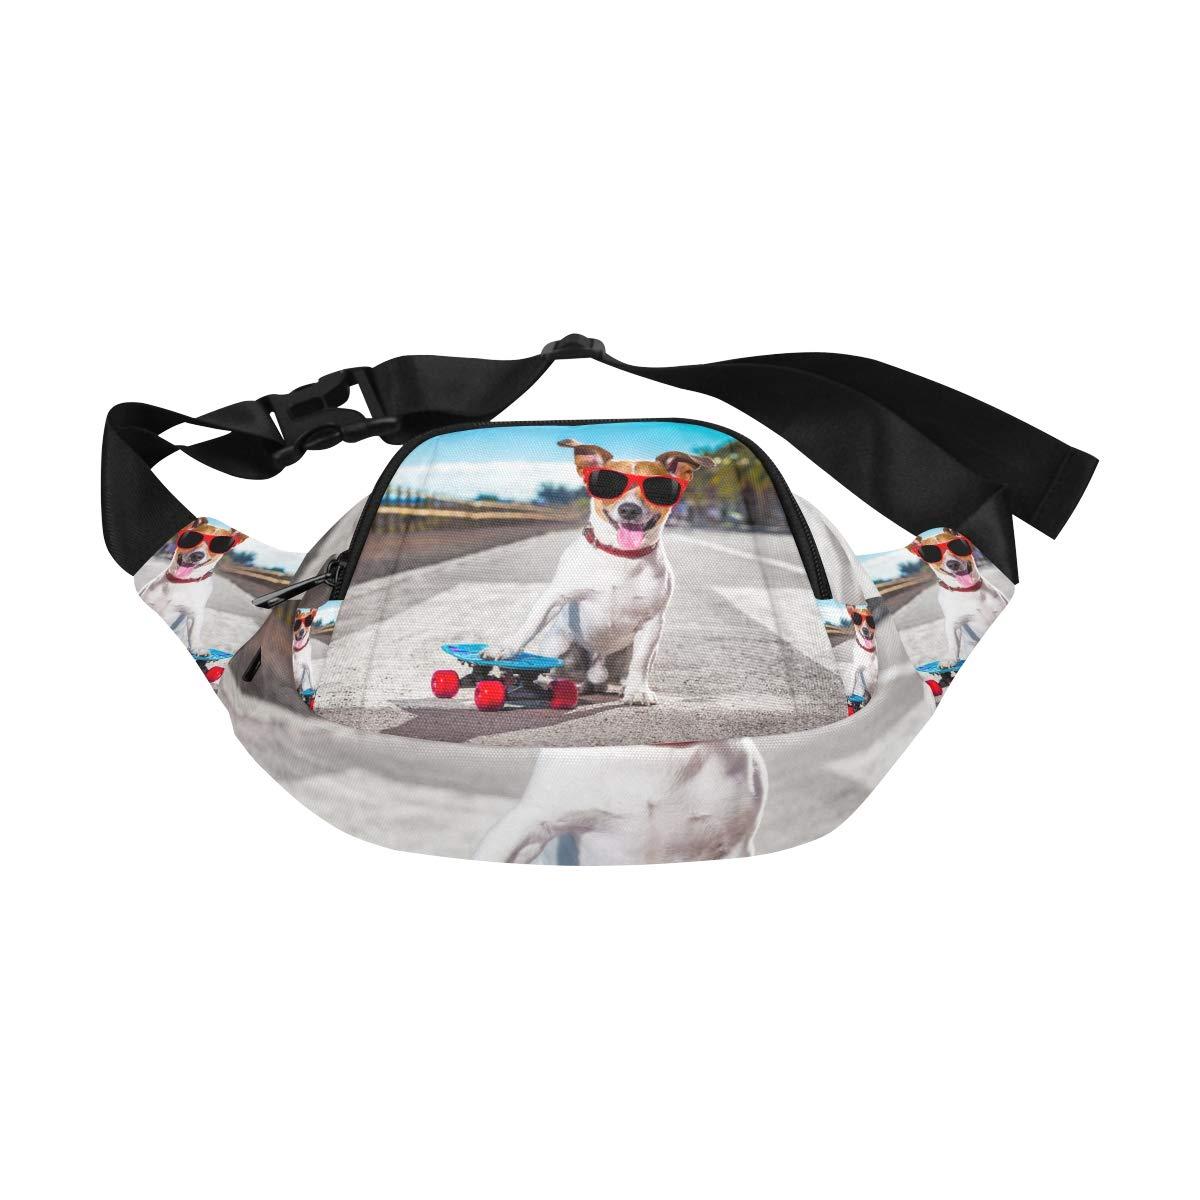 Funny Dog Standing On A Skateboard Fenny Packs Waist Bags Adjustable Belt Waterproof Nylon Travel Running Sport Vacation Party For Men Women Boys Girls Kids